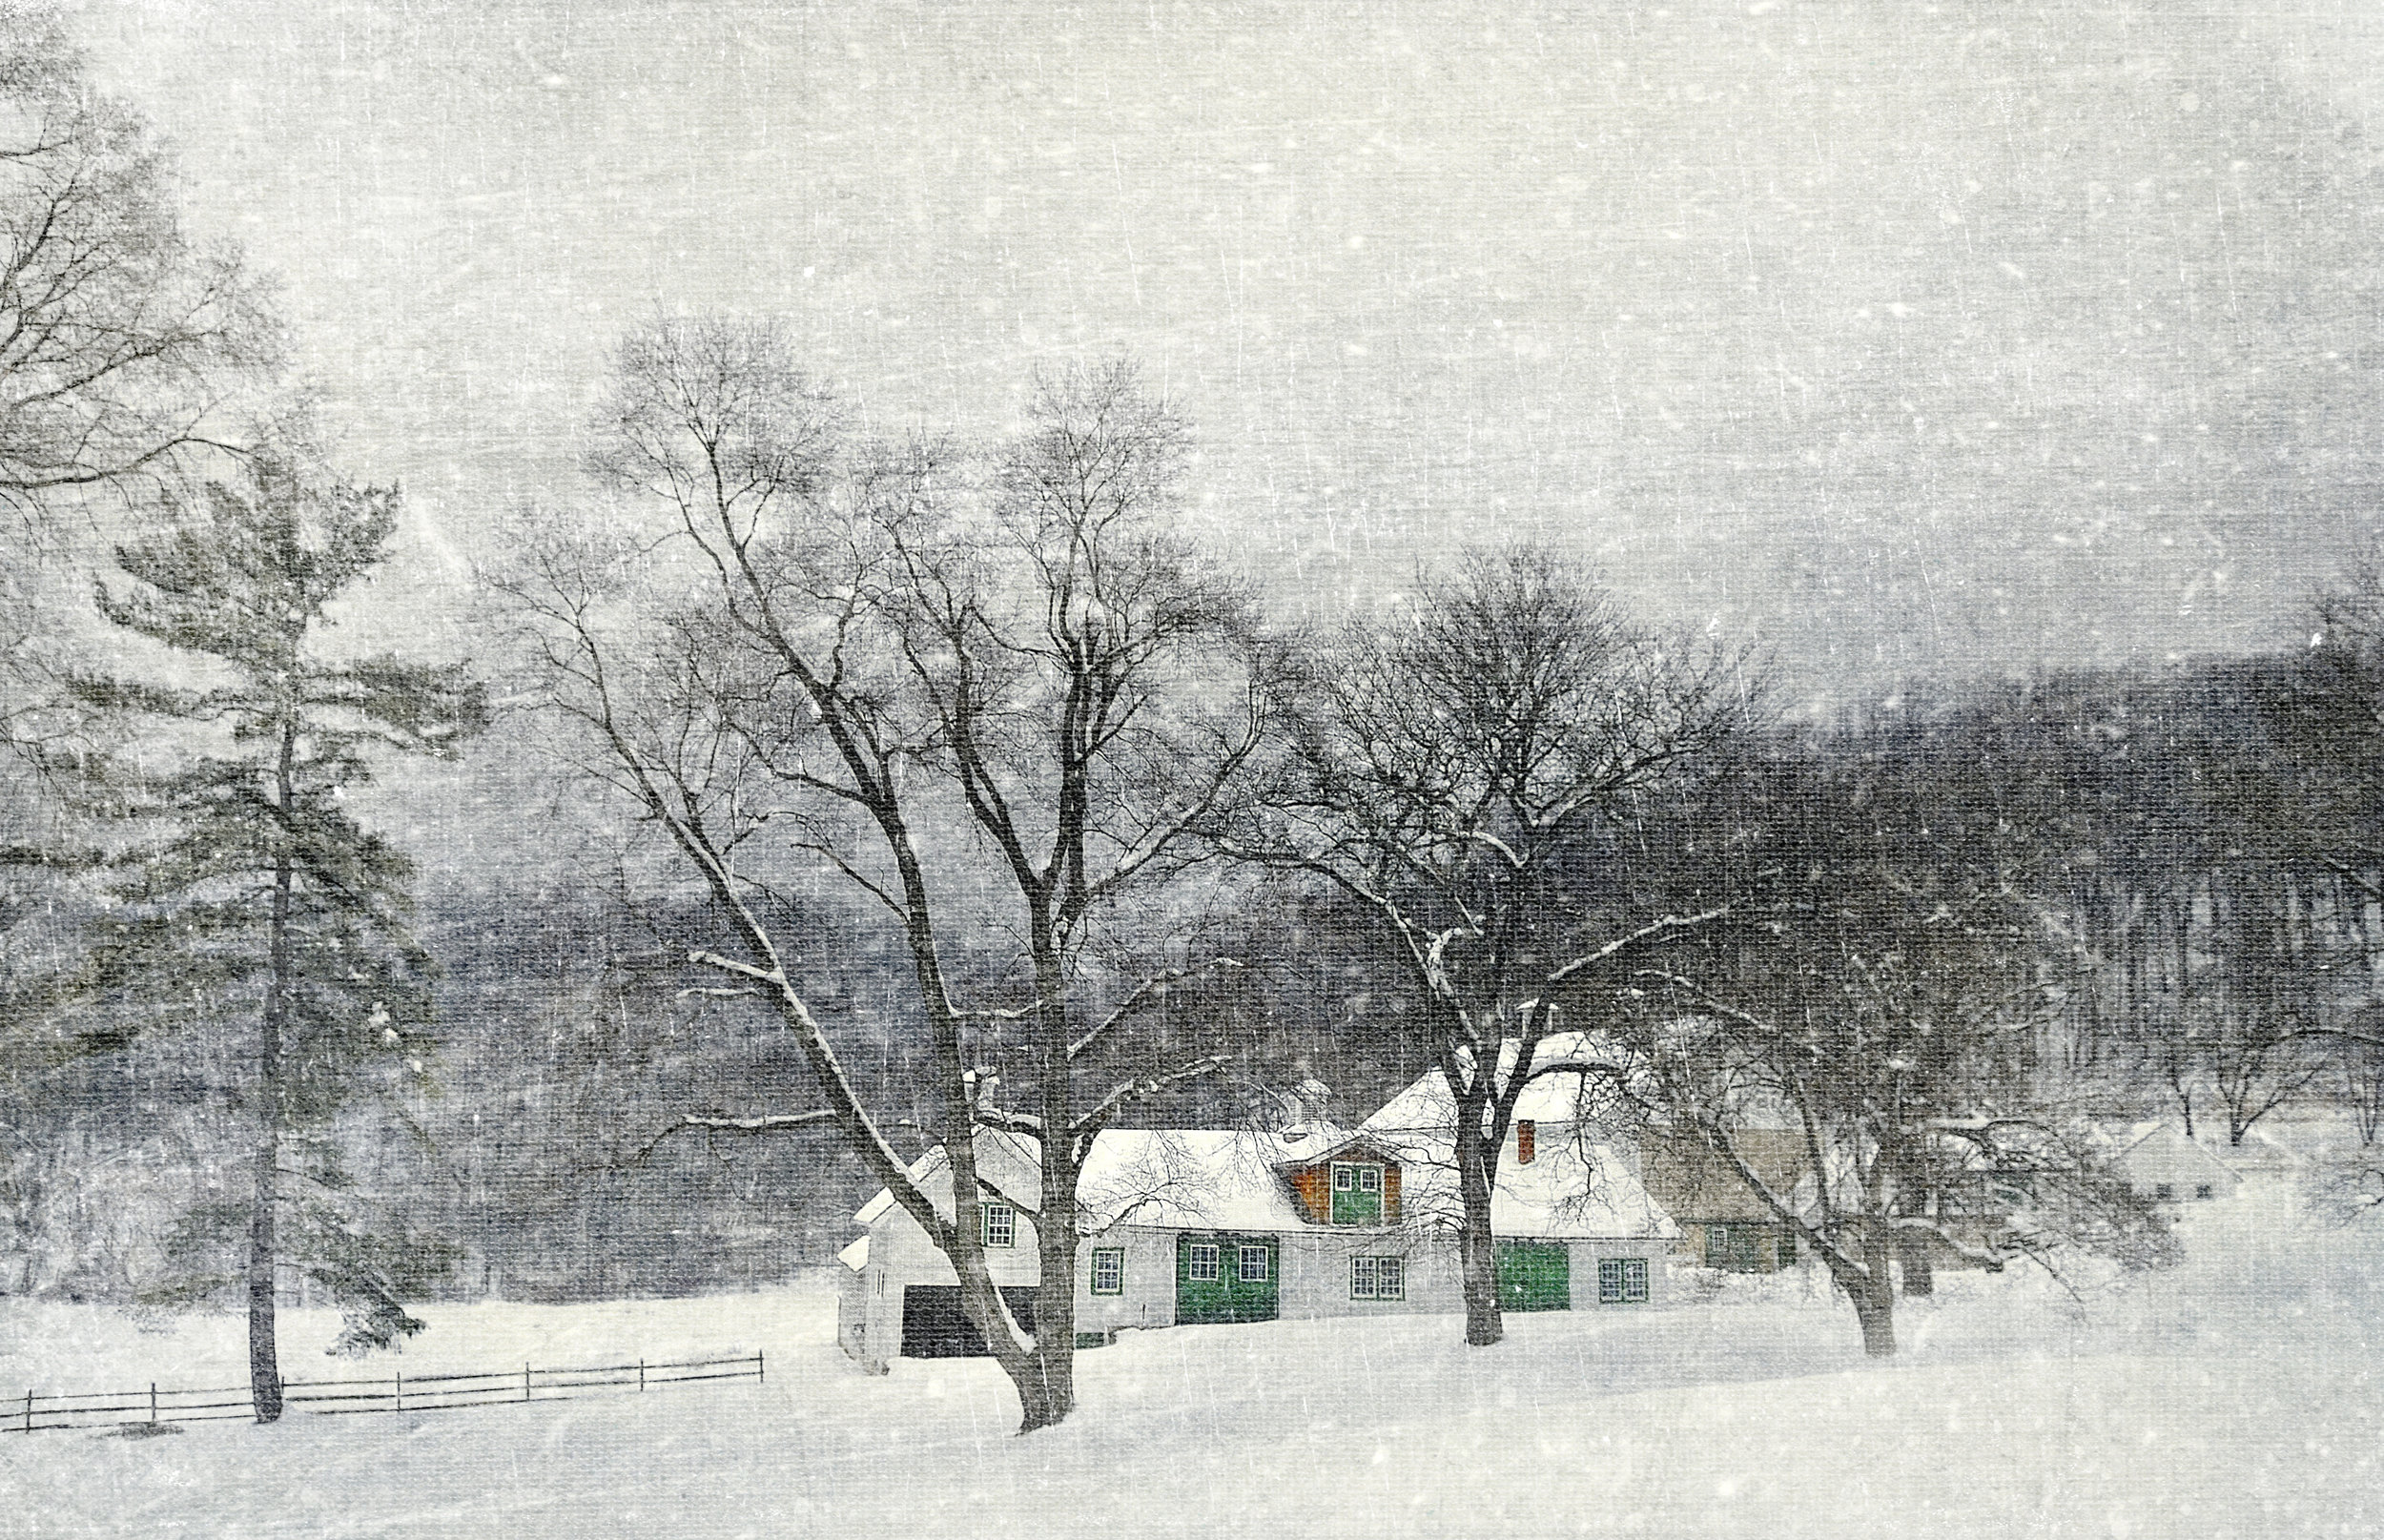 mjt043 - SnowingOnTheKnoxBarn.jpg